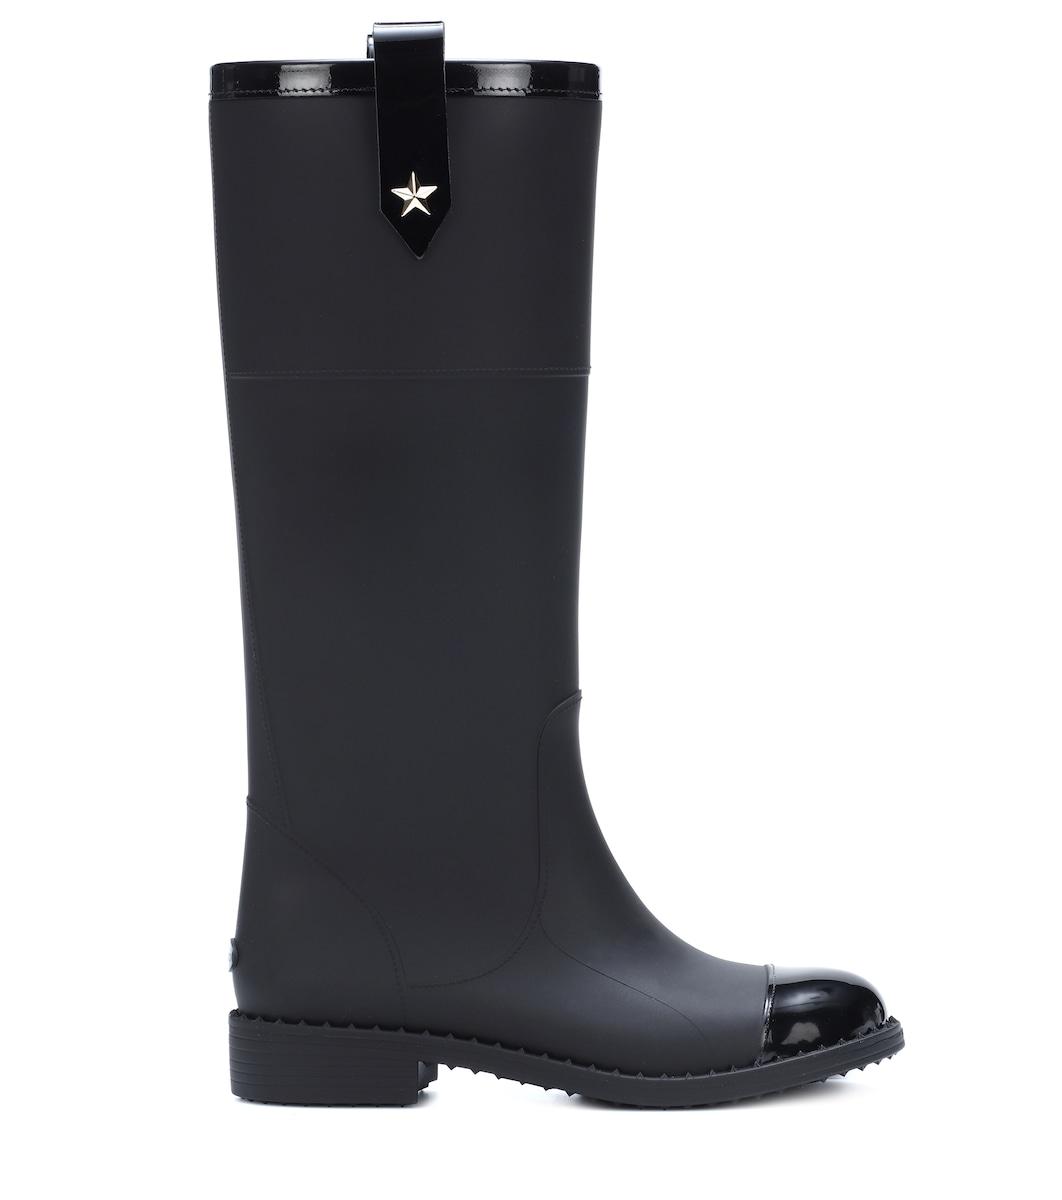 4f756d89055 Edith Rubber Boots | Jimmy Choo - mytheresa